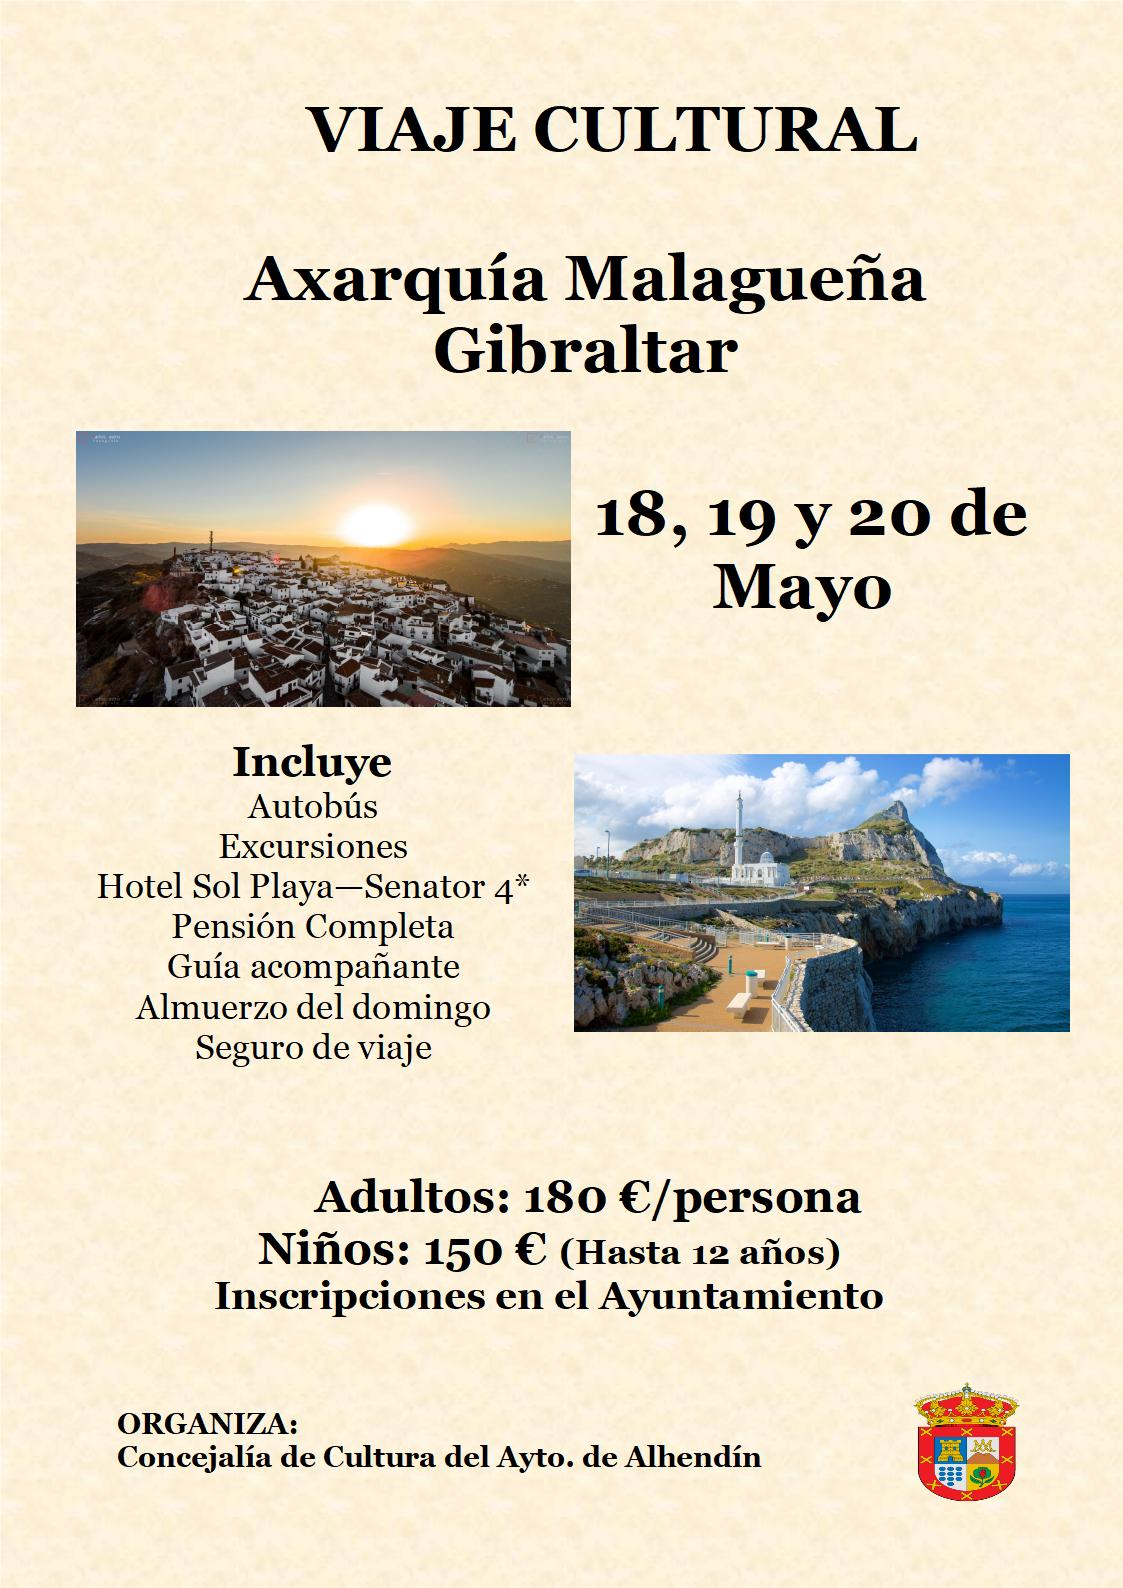 Cartel-Ruta-cultural-Axarquia-Malagueña-y-Gibraltar